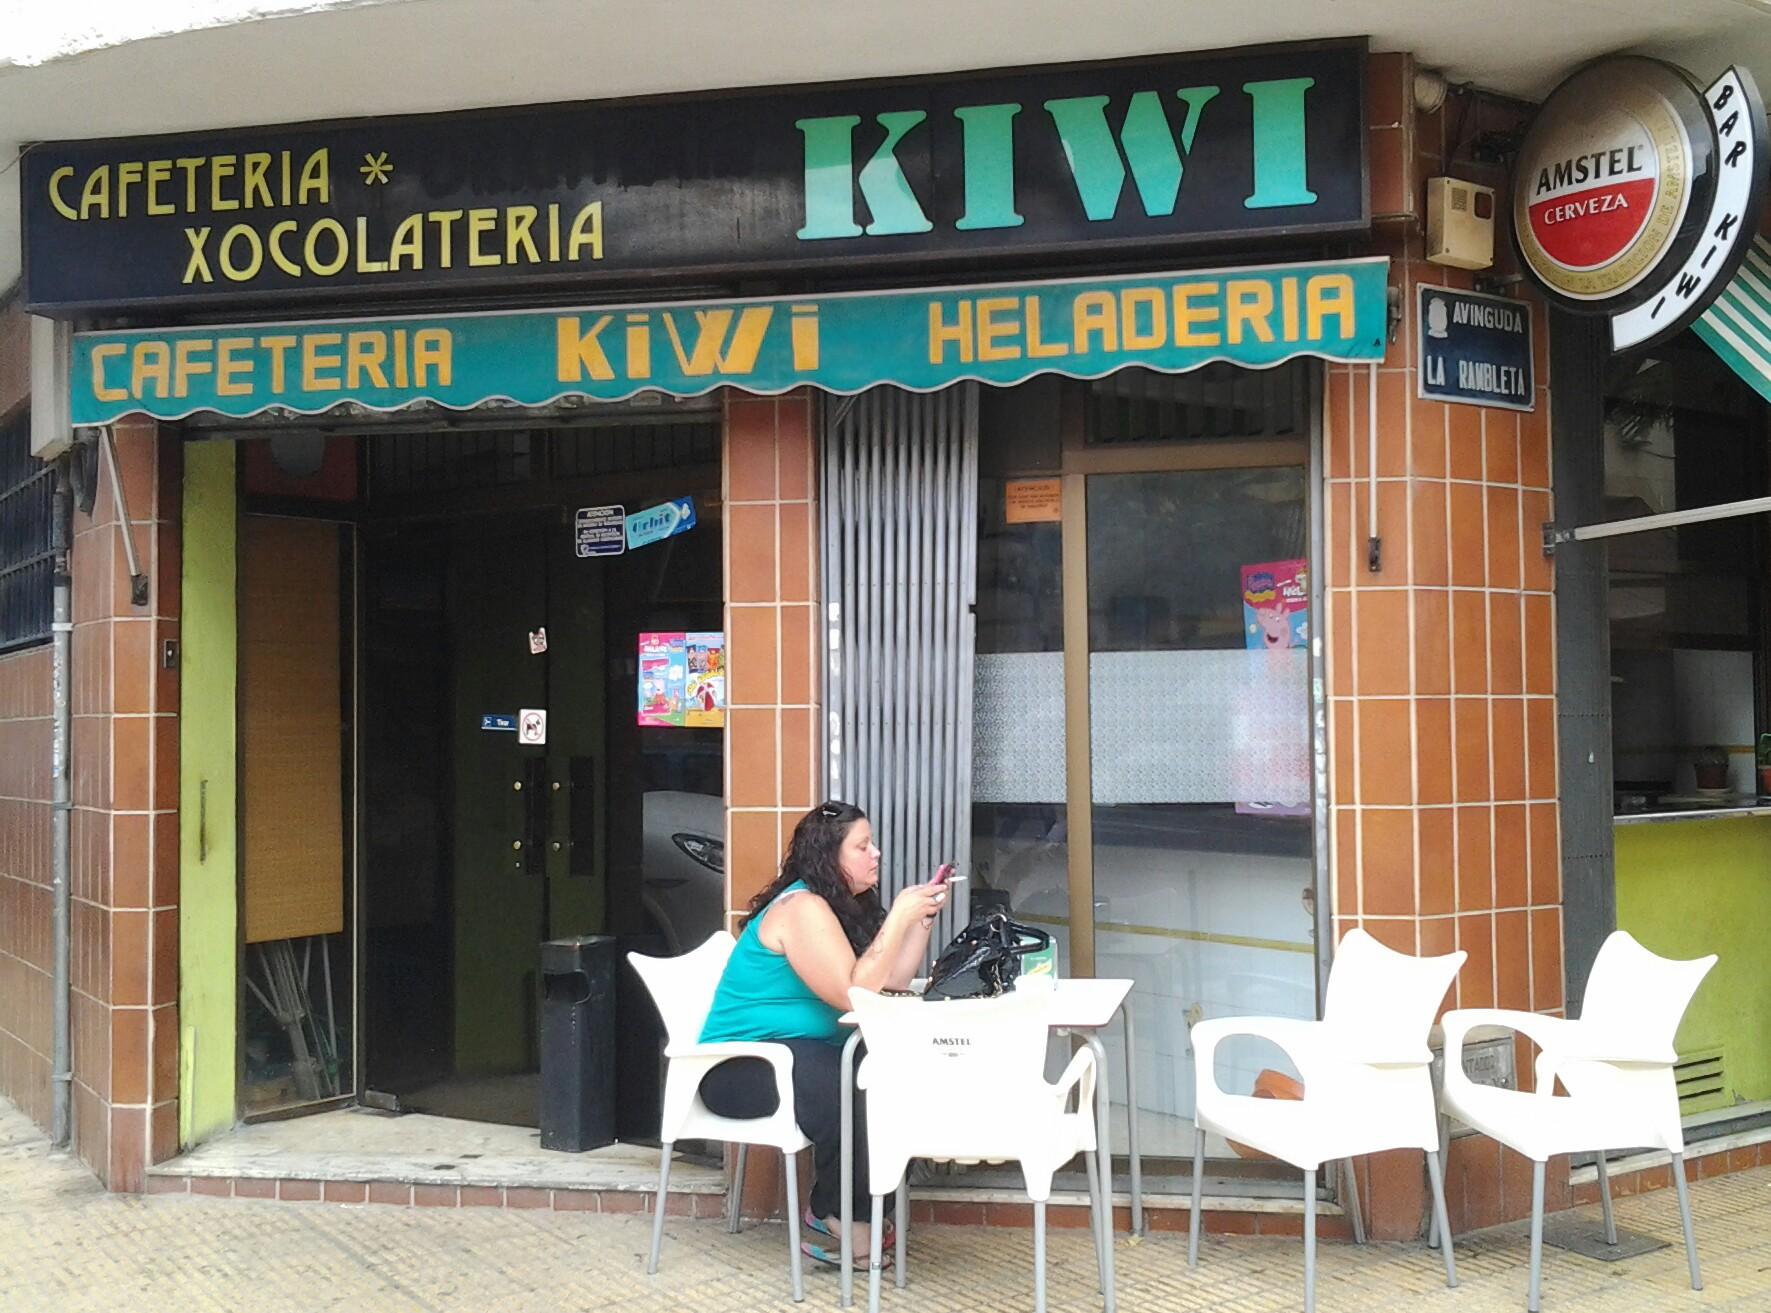 BAR CAFETERIA KIWI